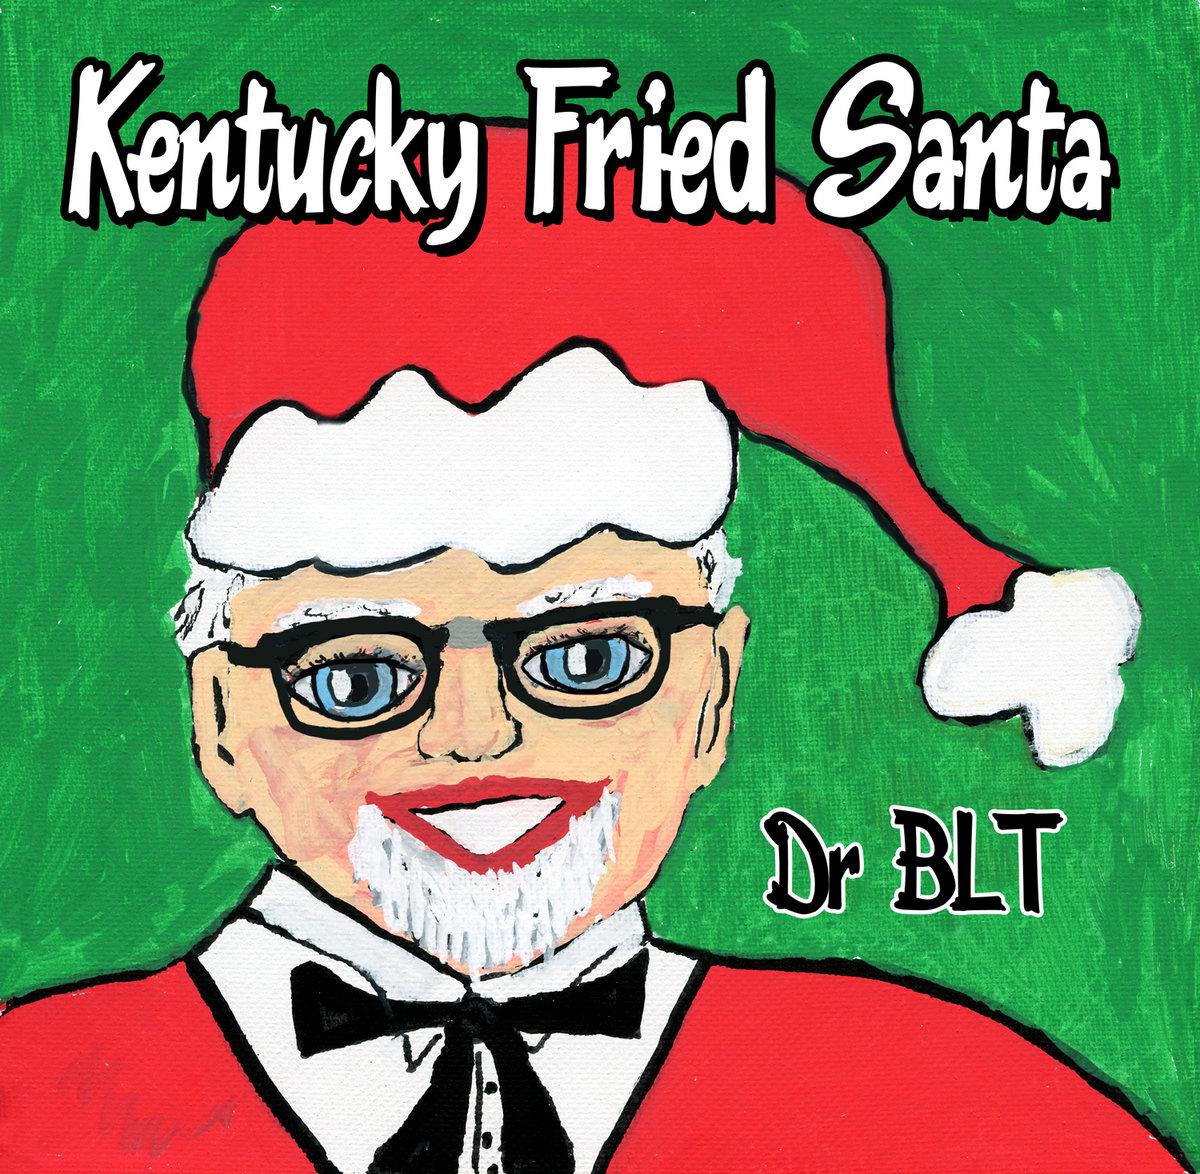 Ballad of Kentucky Fried Santa Part II by Dr BLT